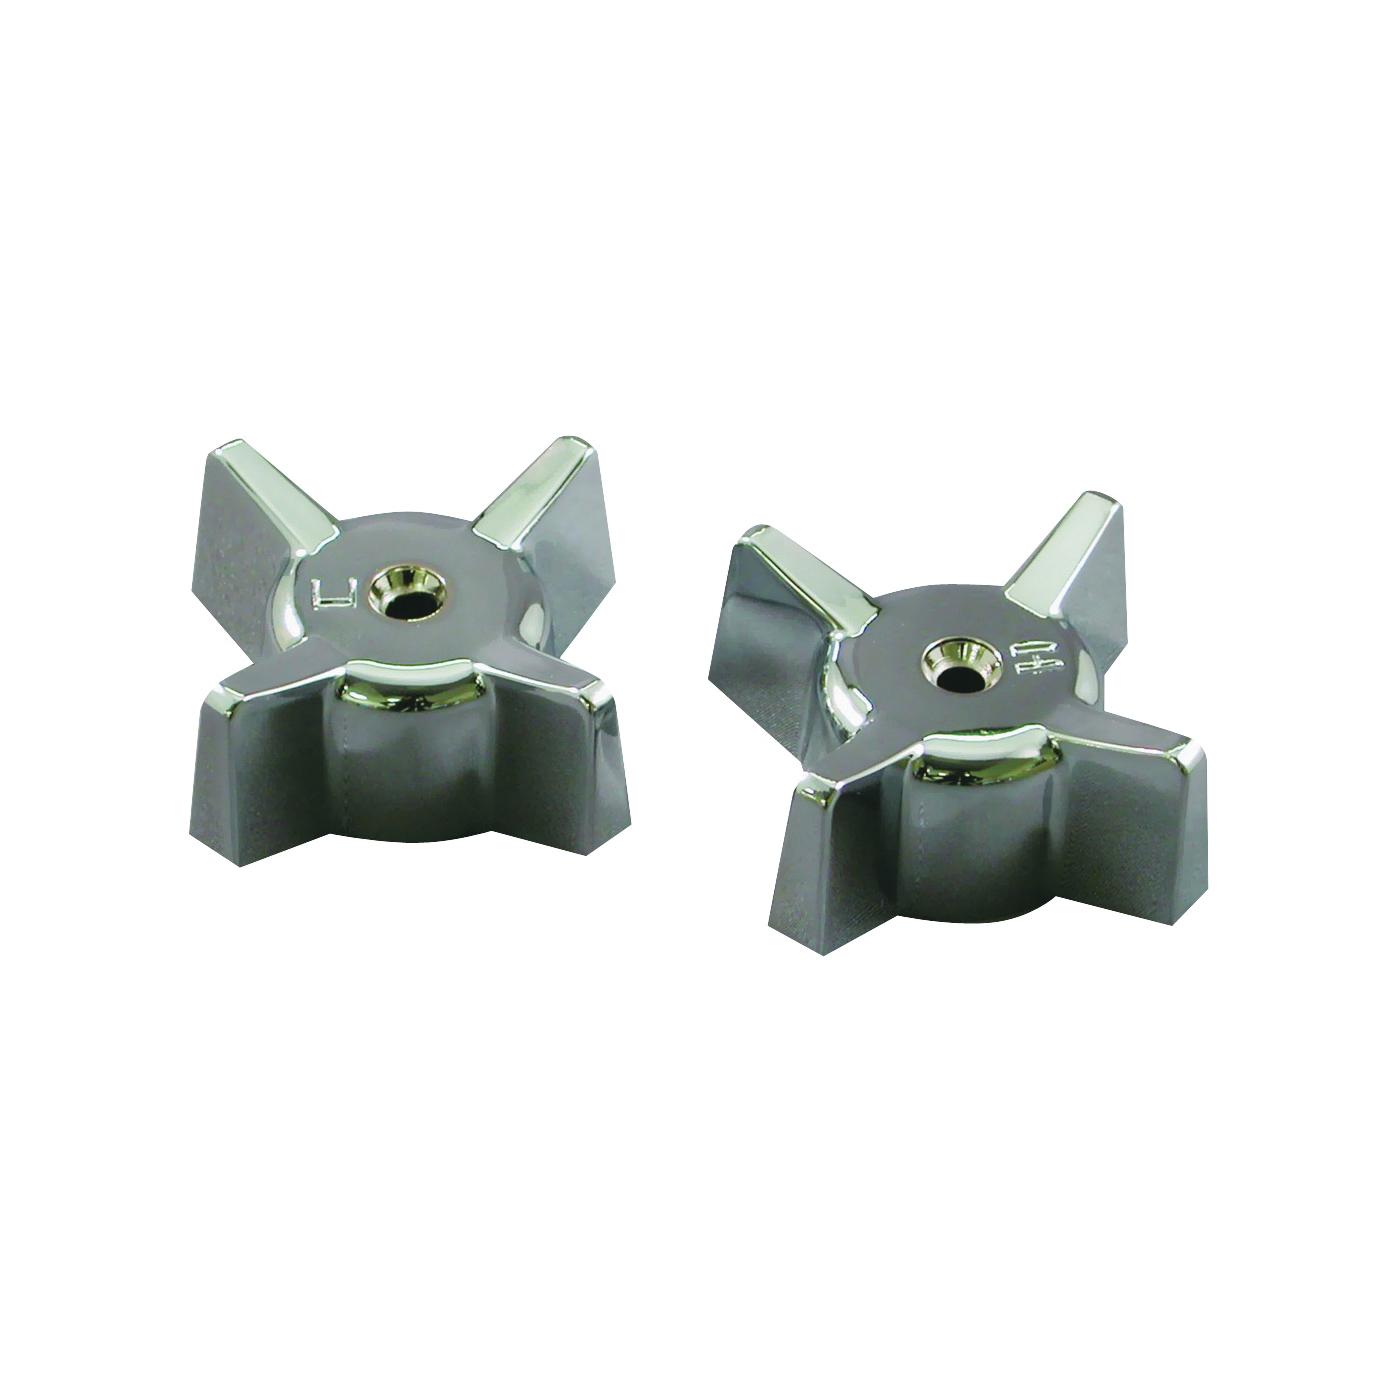 Picture of Danco 88090 Faucet Handle, Zinc, Chrome, For: Gerber Two-Handle Tub/Shower Faucets